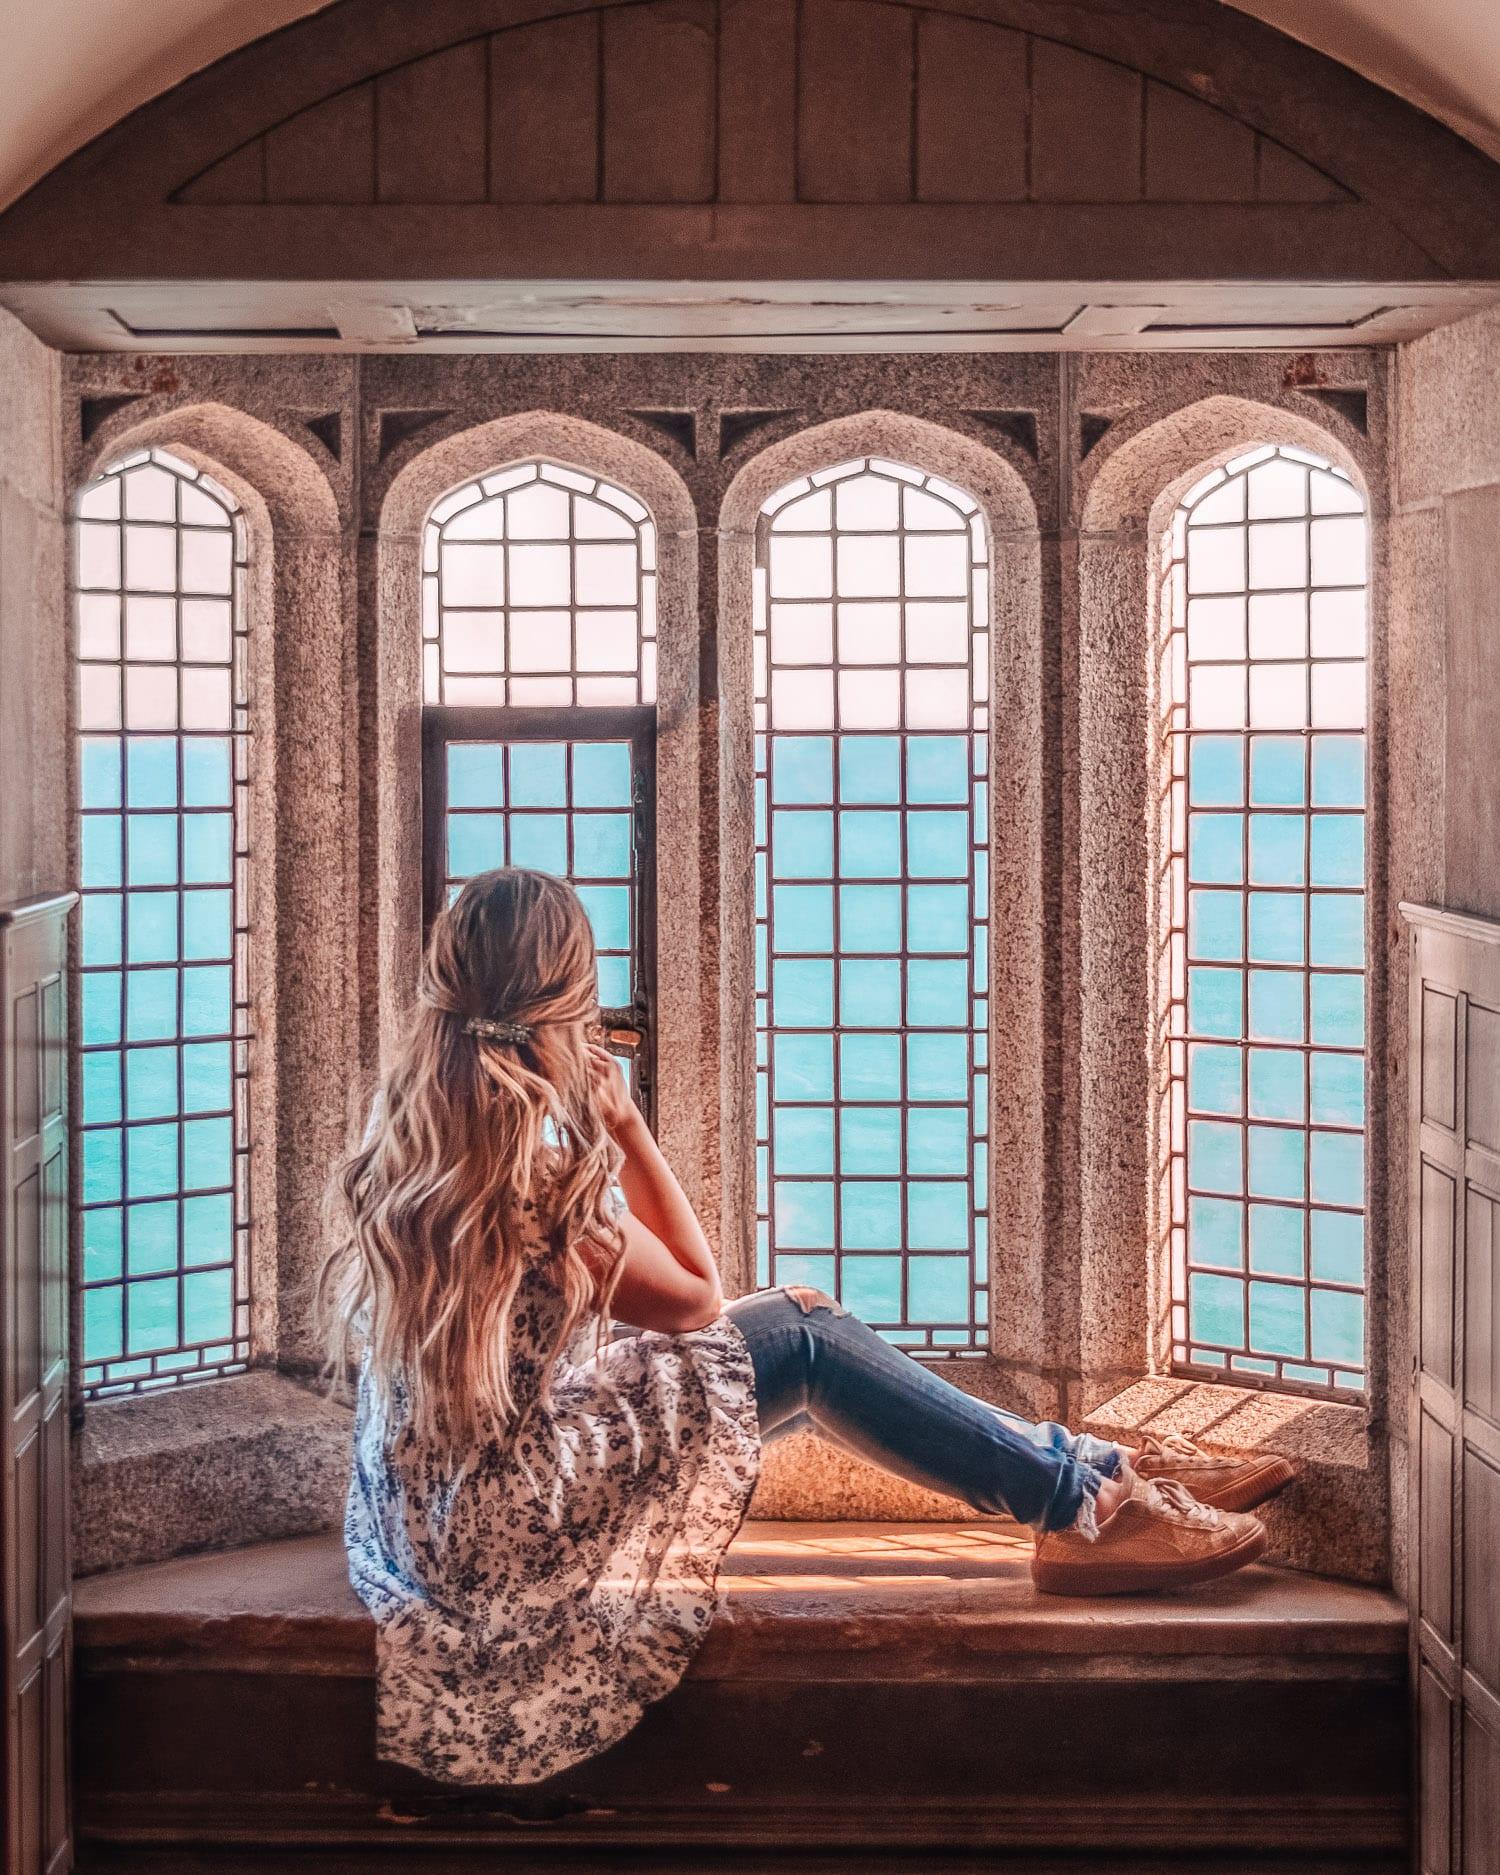 Castle window - St. Michael's Mount, Cornwall, UK